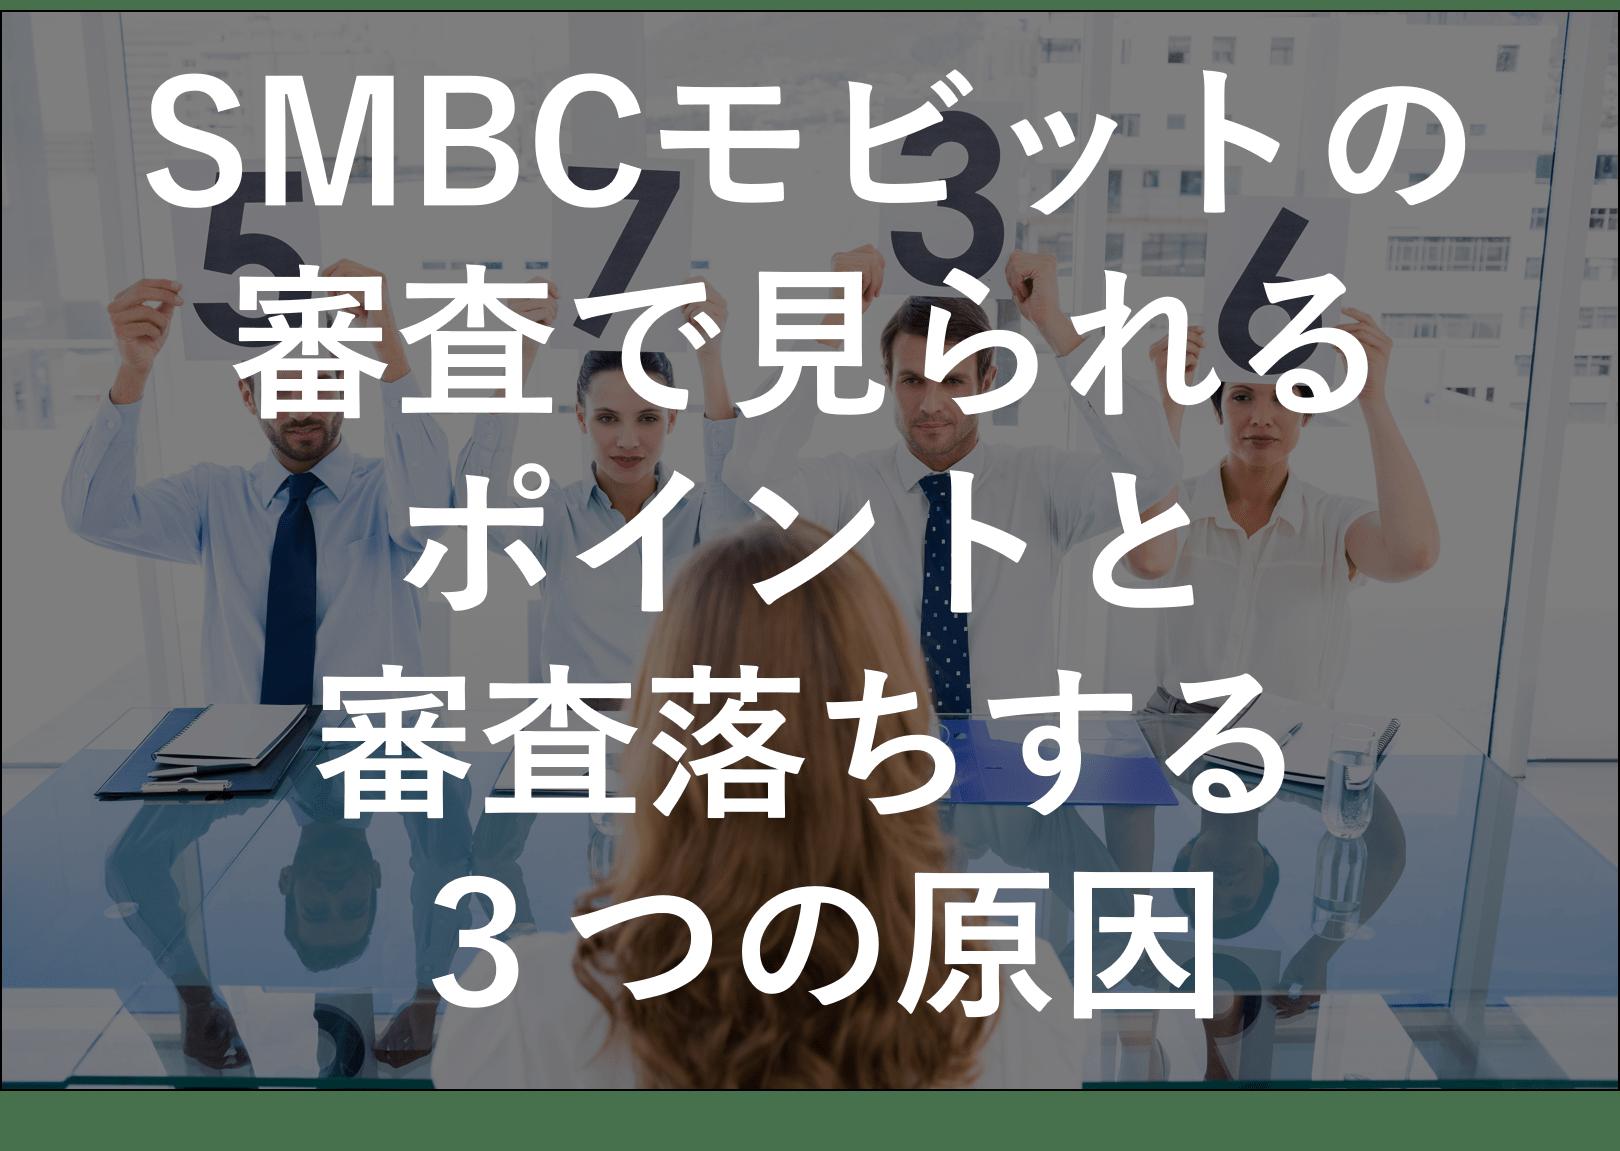 SMBCモビット 審査 トップ